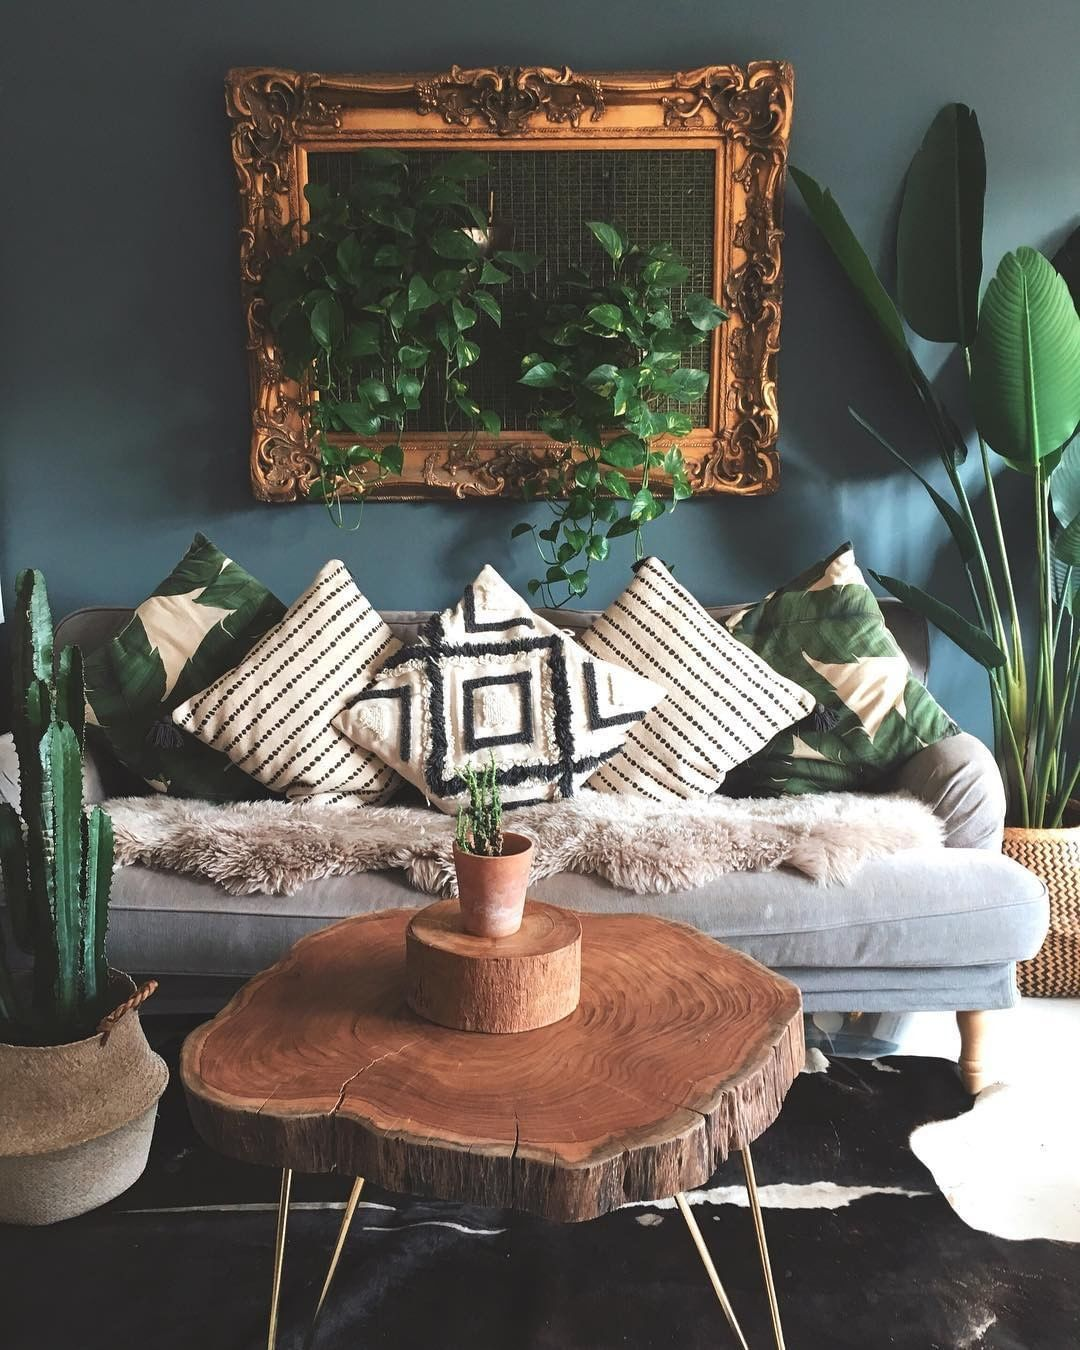 "Photo of Interior Boho Home Decor on Instagram: ""Via @free_wildlife Do you like the coffee table?? . Follow us for more @bohemian_heaven . Credits @la_sidhu . #interior2you…"""